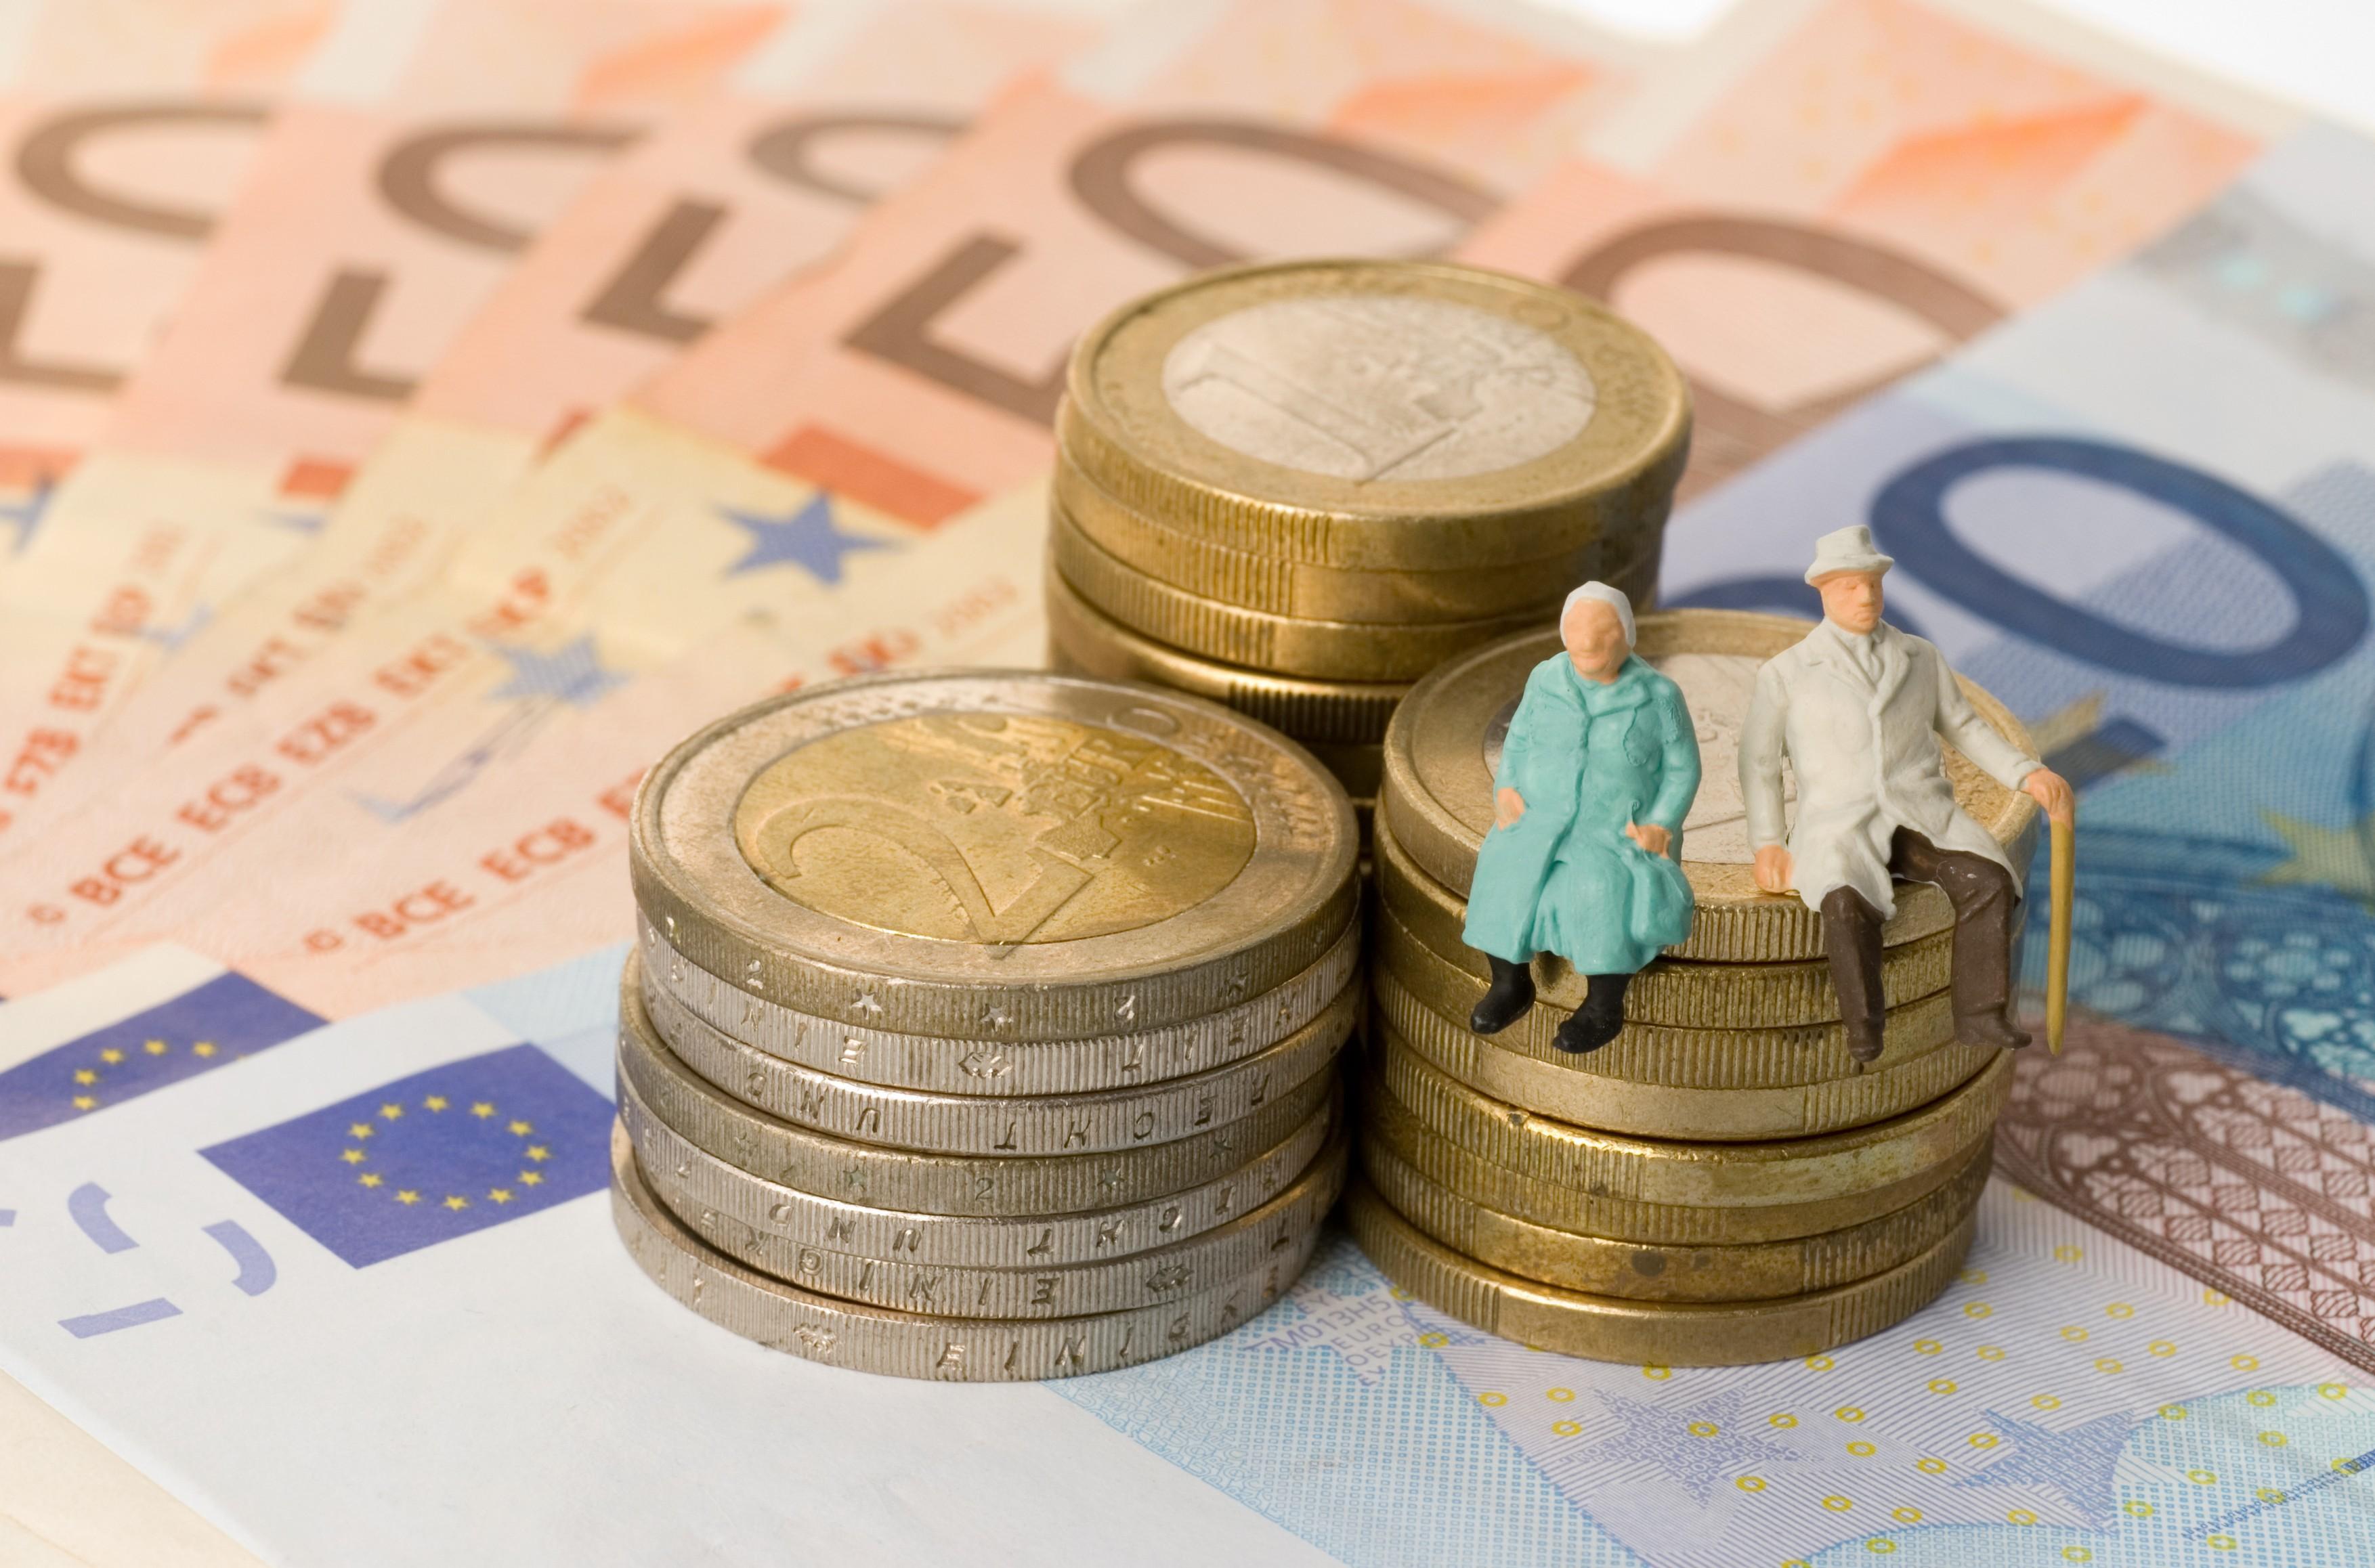 STUDIU DE CAZ: Risti pe o moneda exotica si castigi cota de piata romaneasca